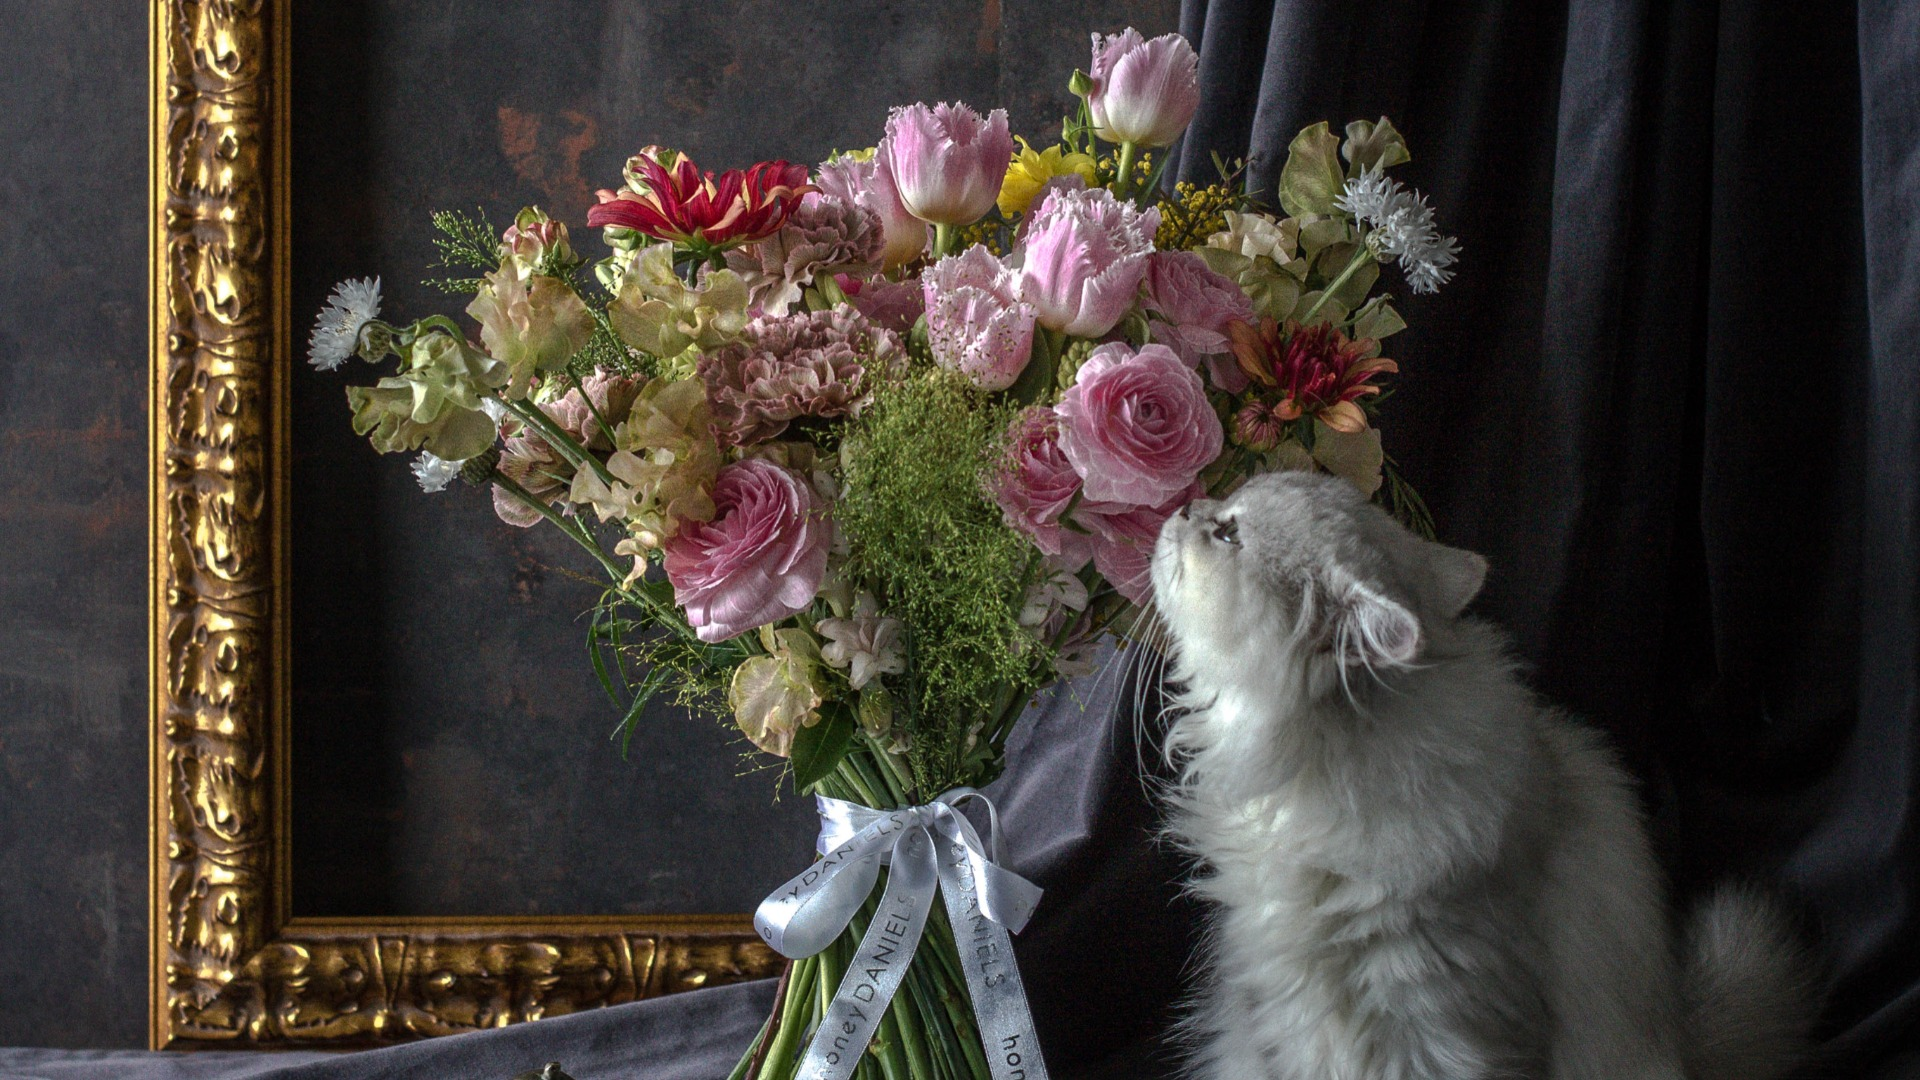 honeyDANIELS Florist打造城市叢林裡華麗而自然的歐式花藝美學